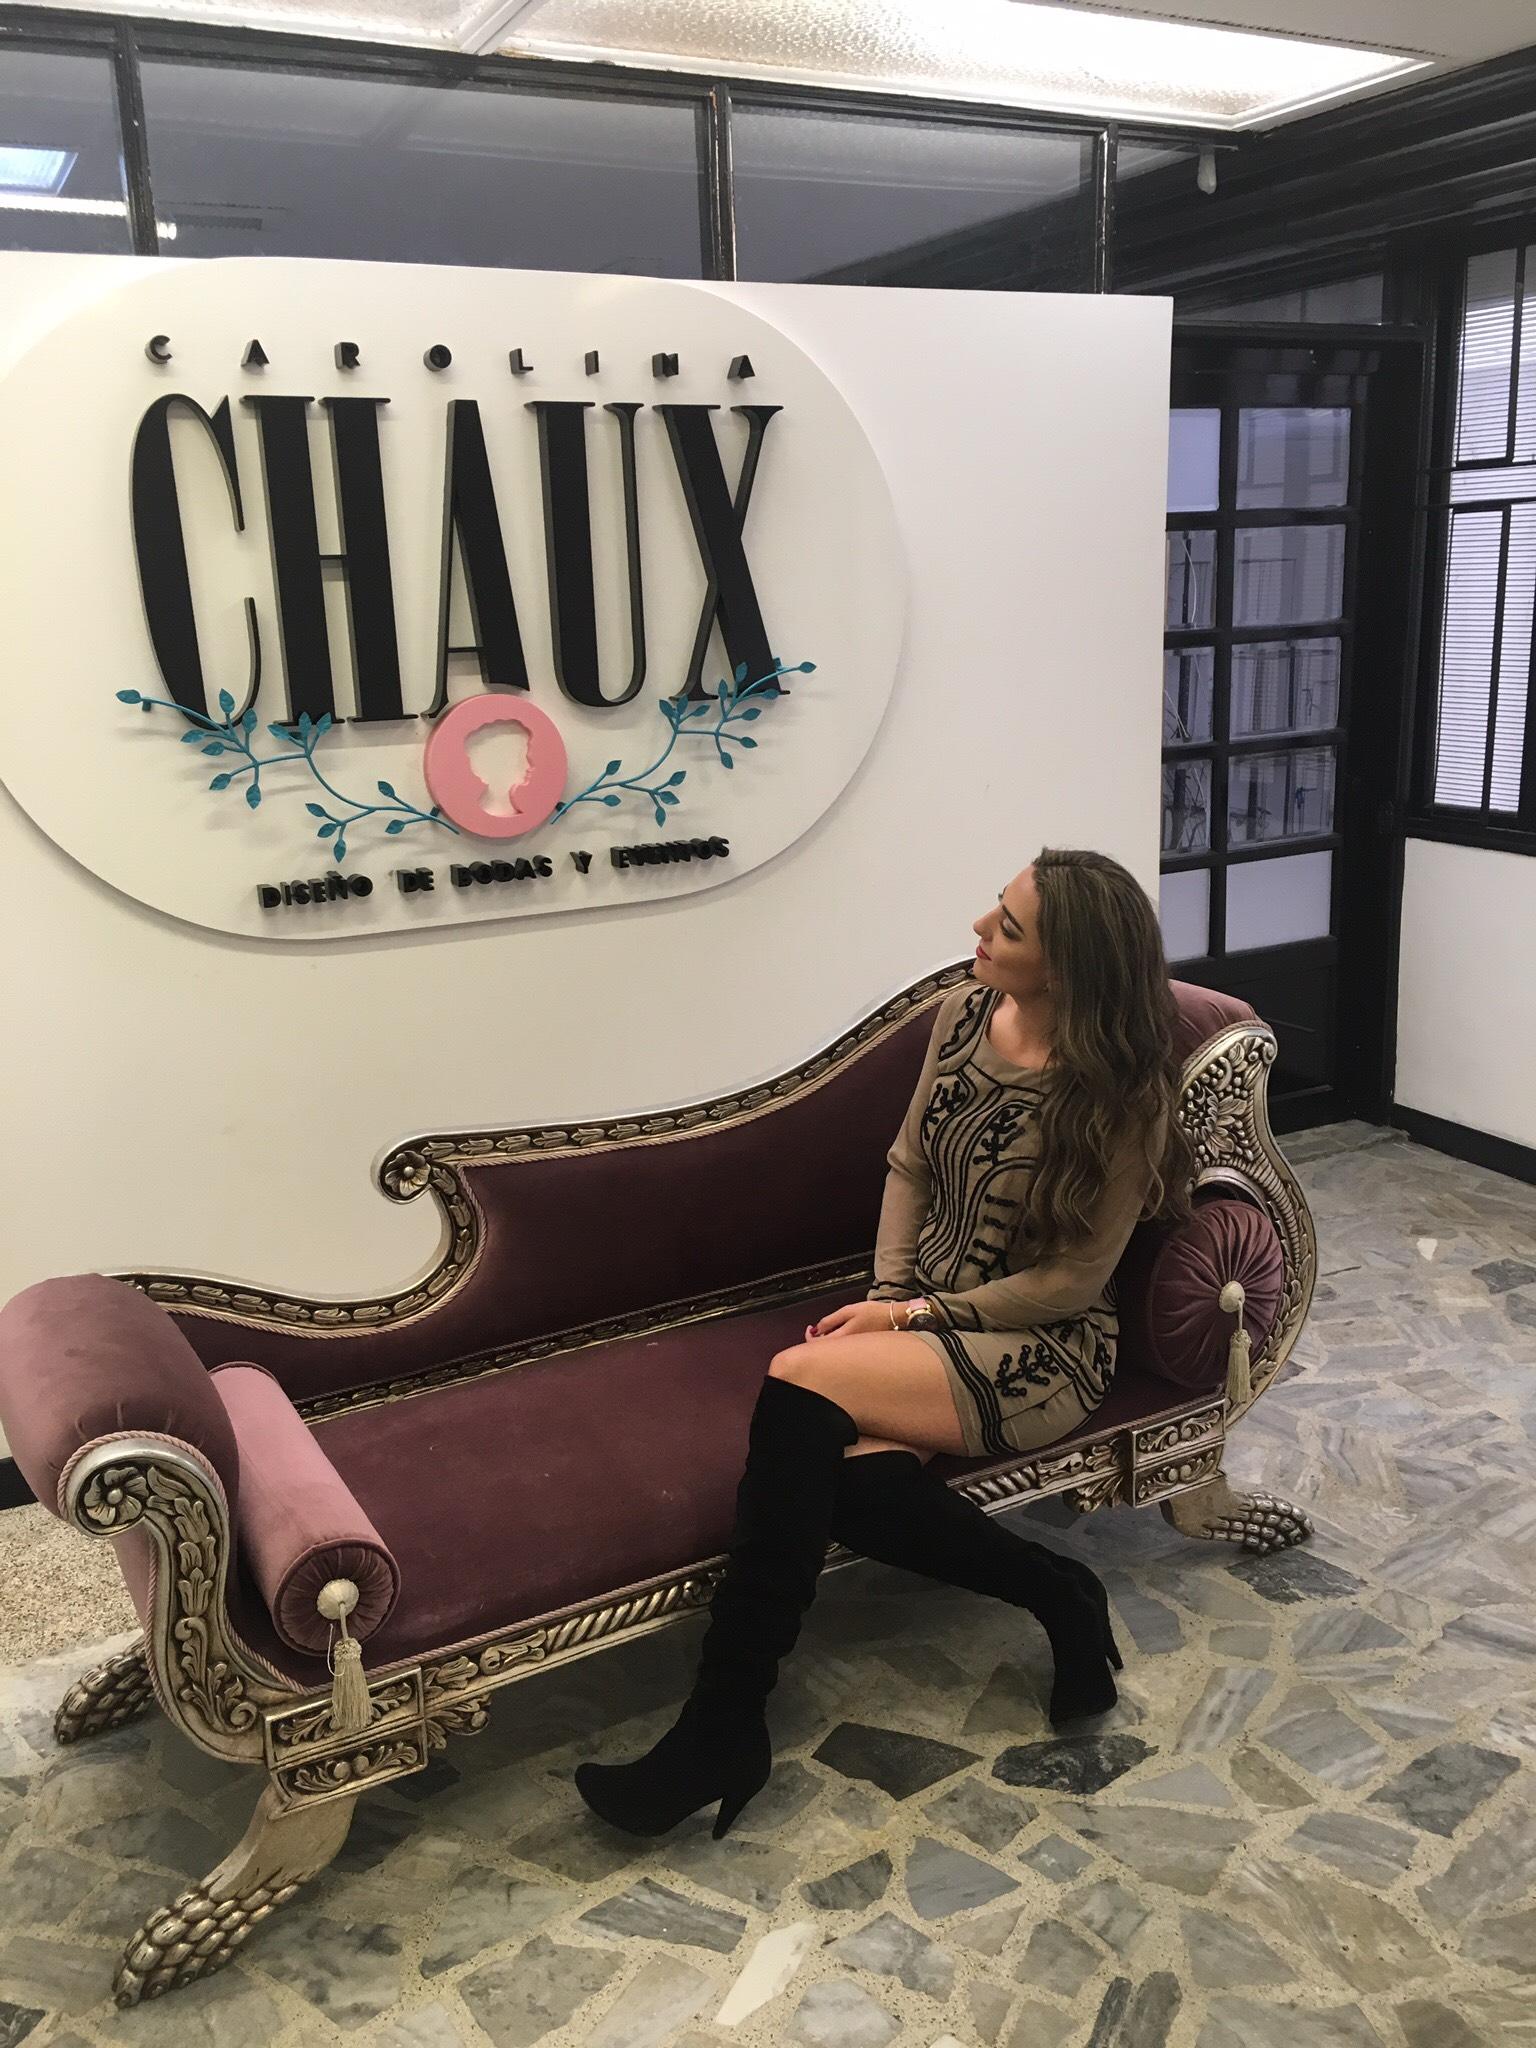 Momentos Chaux